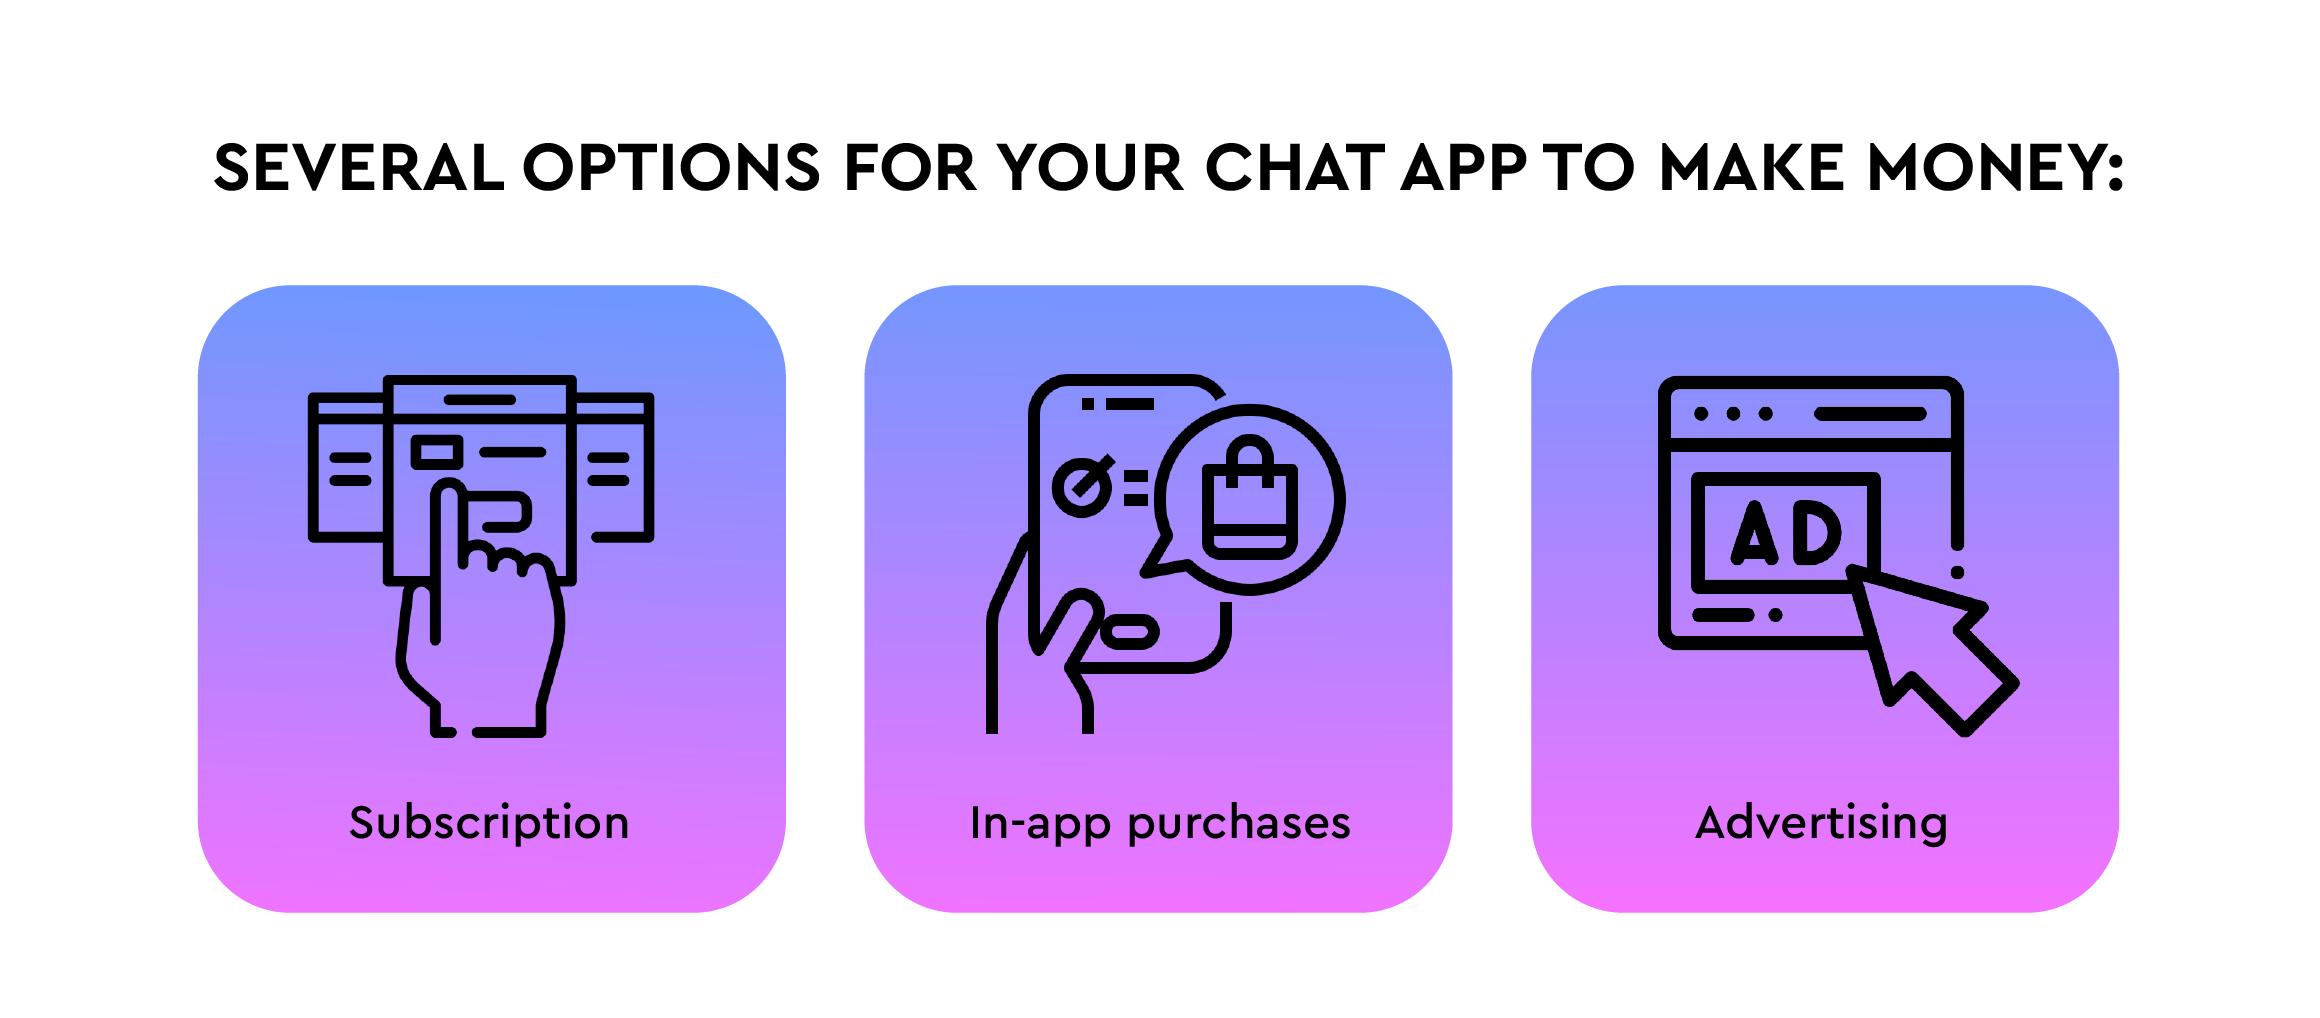 Chat app monetization strategies